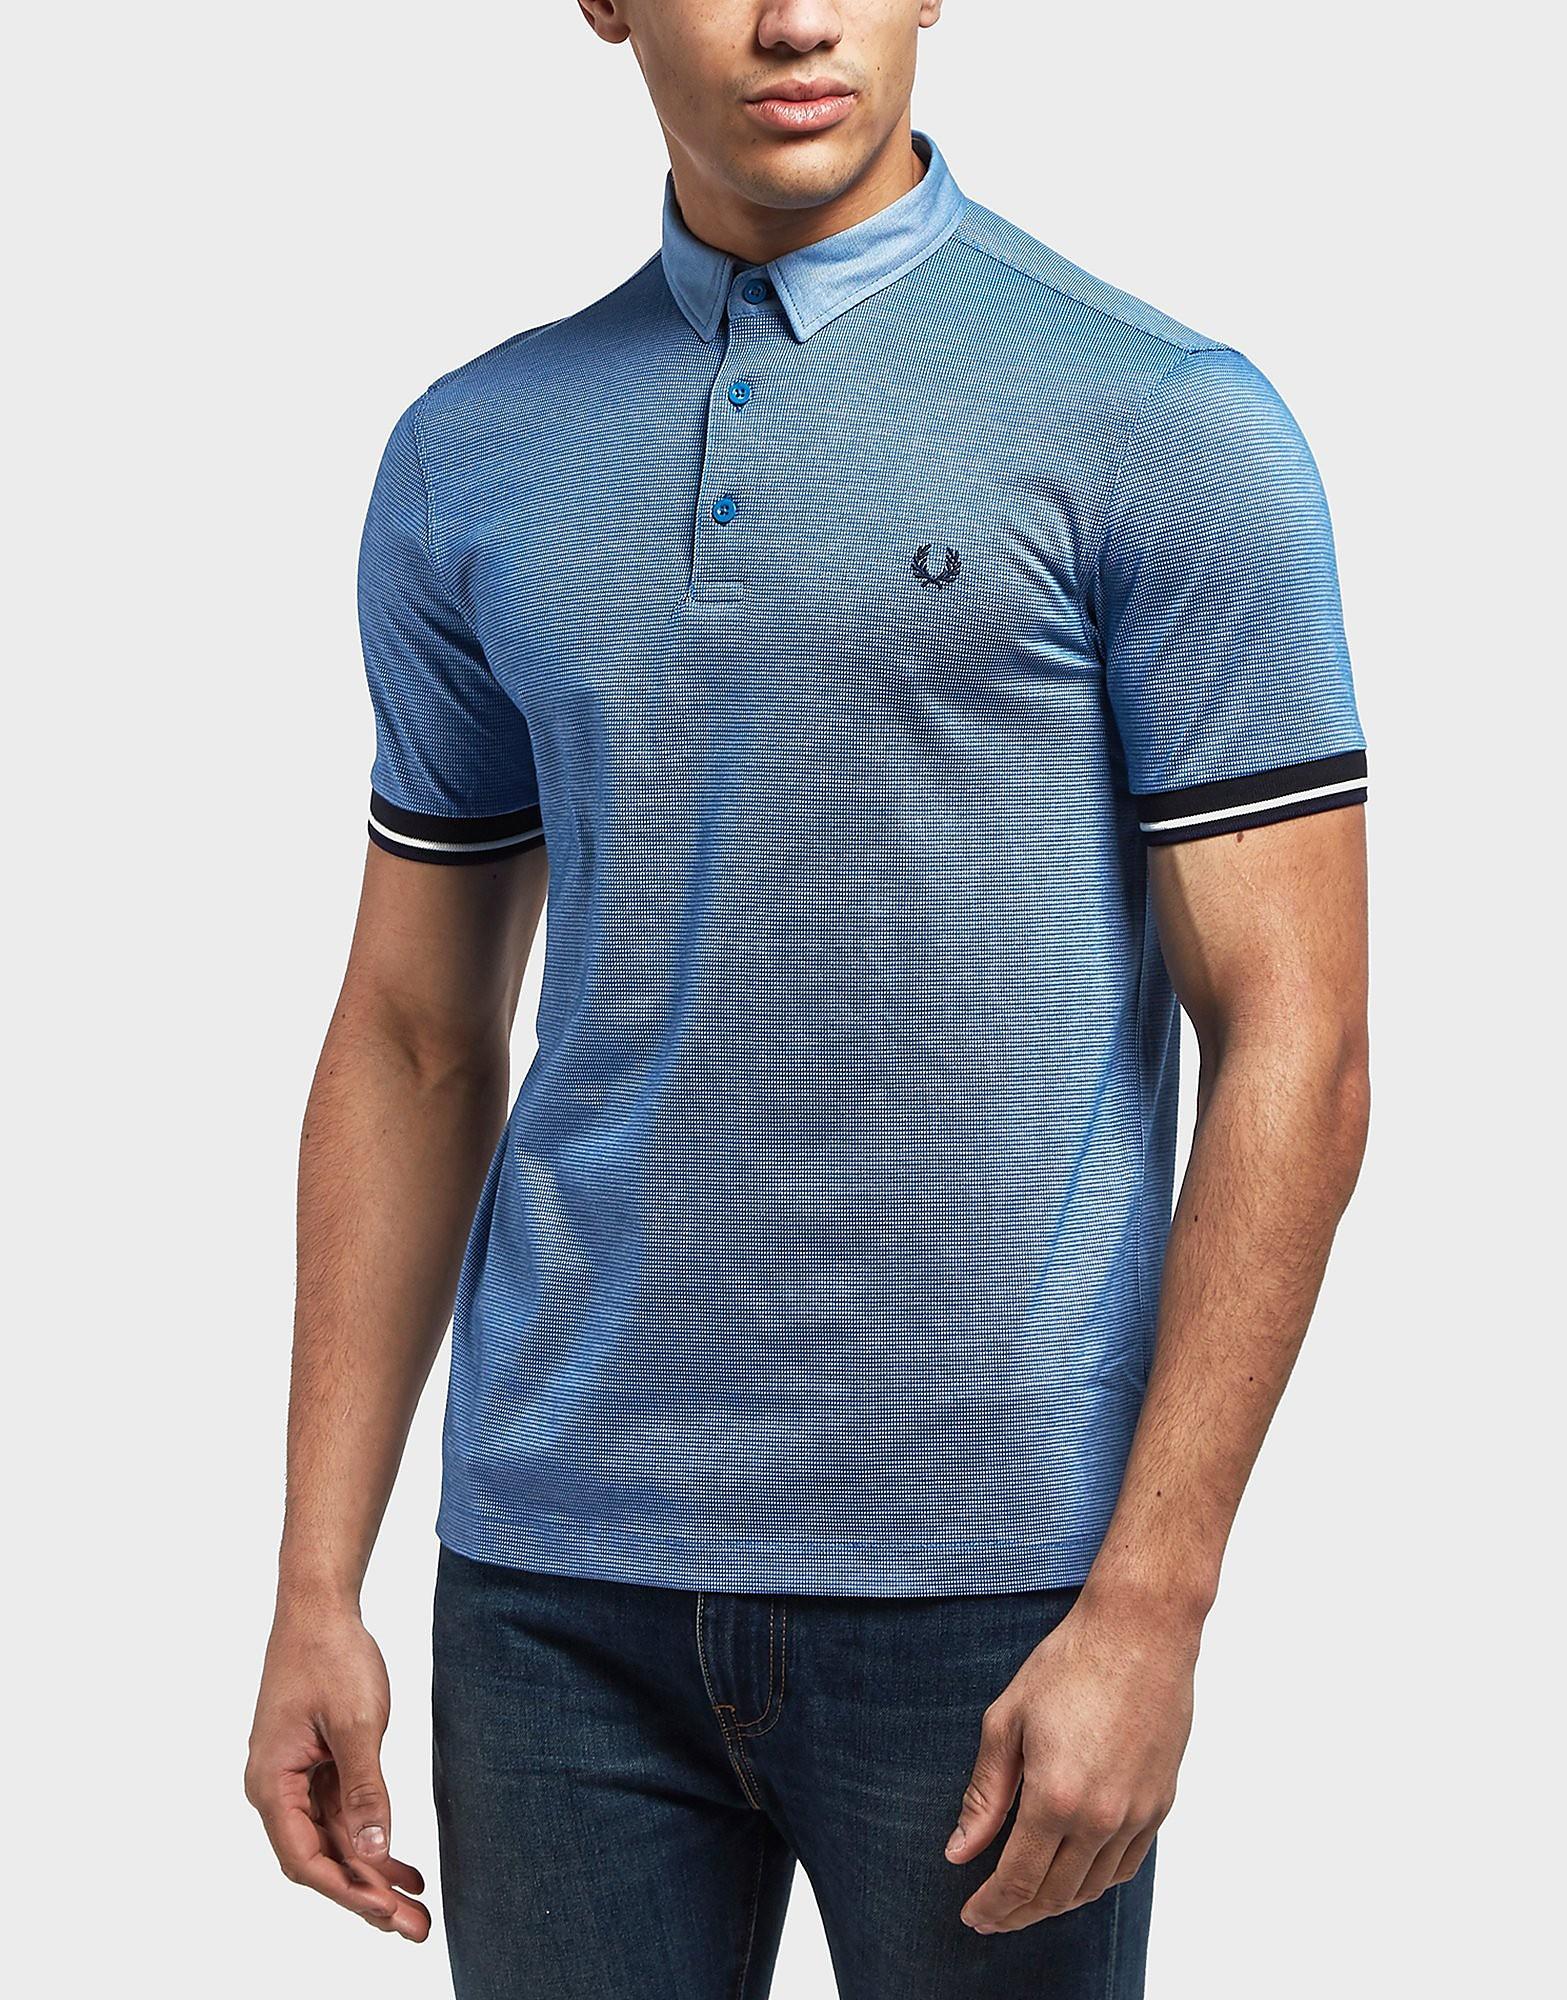 Fred Perry Woven Collar Short Sleeve Polo Shirt